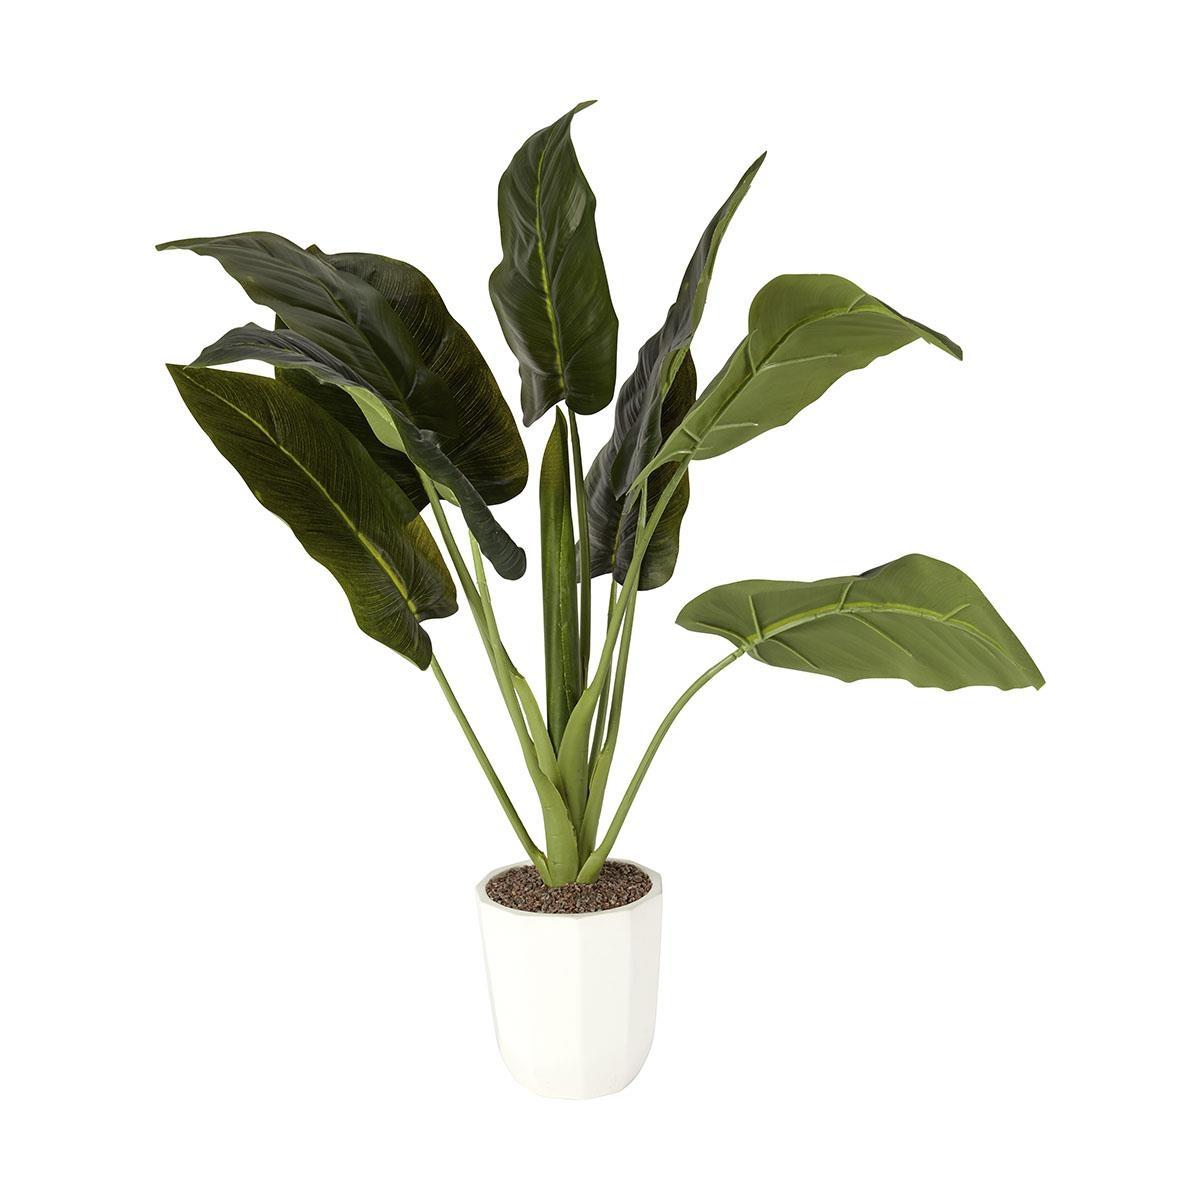 Artificial anthurium plant kmart for Artificial banana leaves decoration